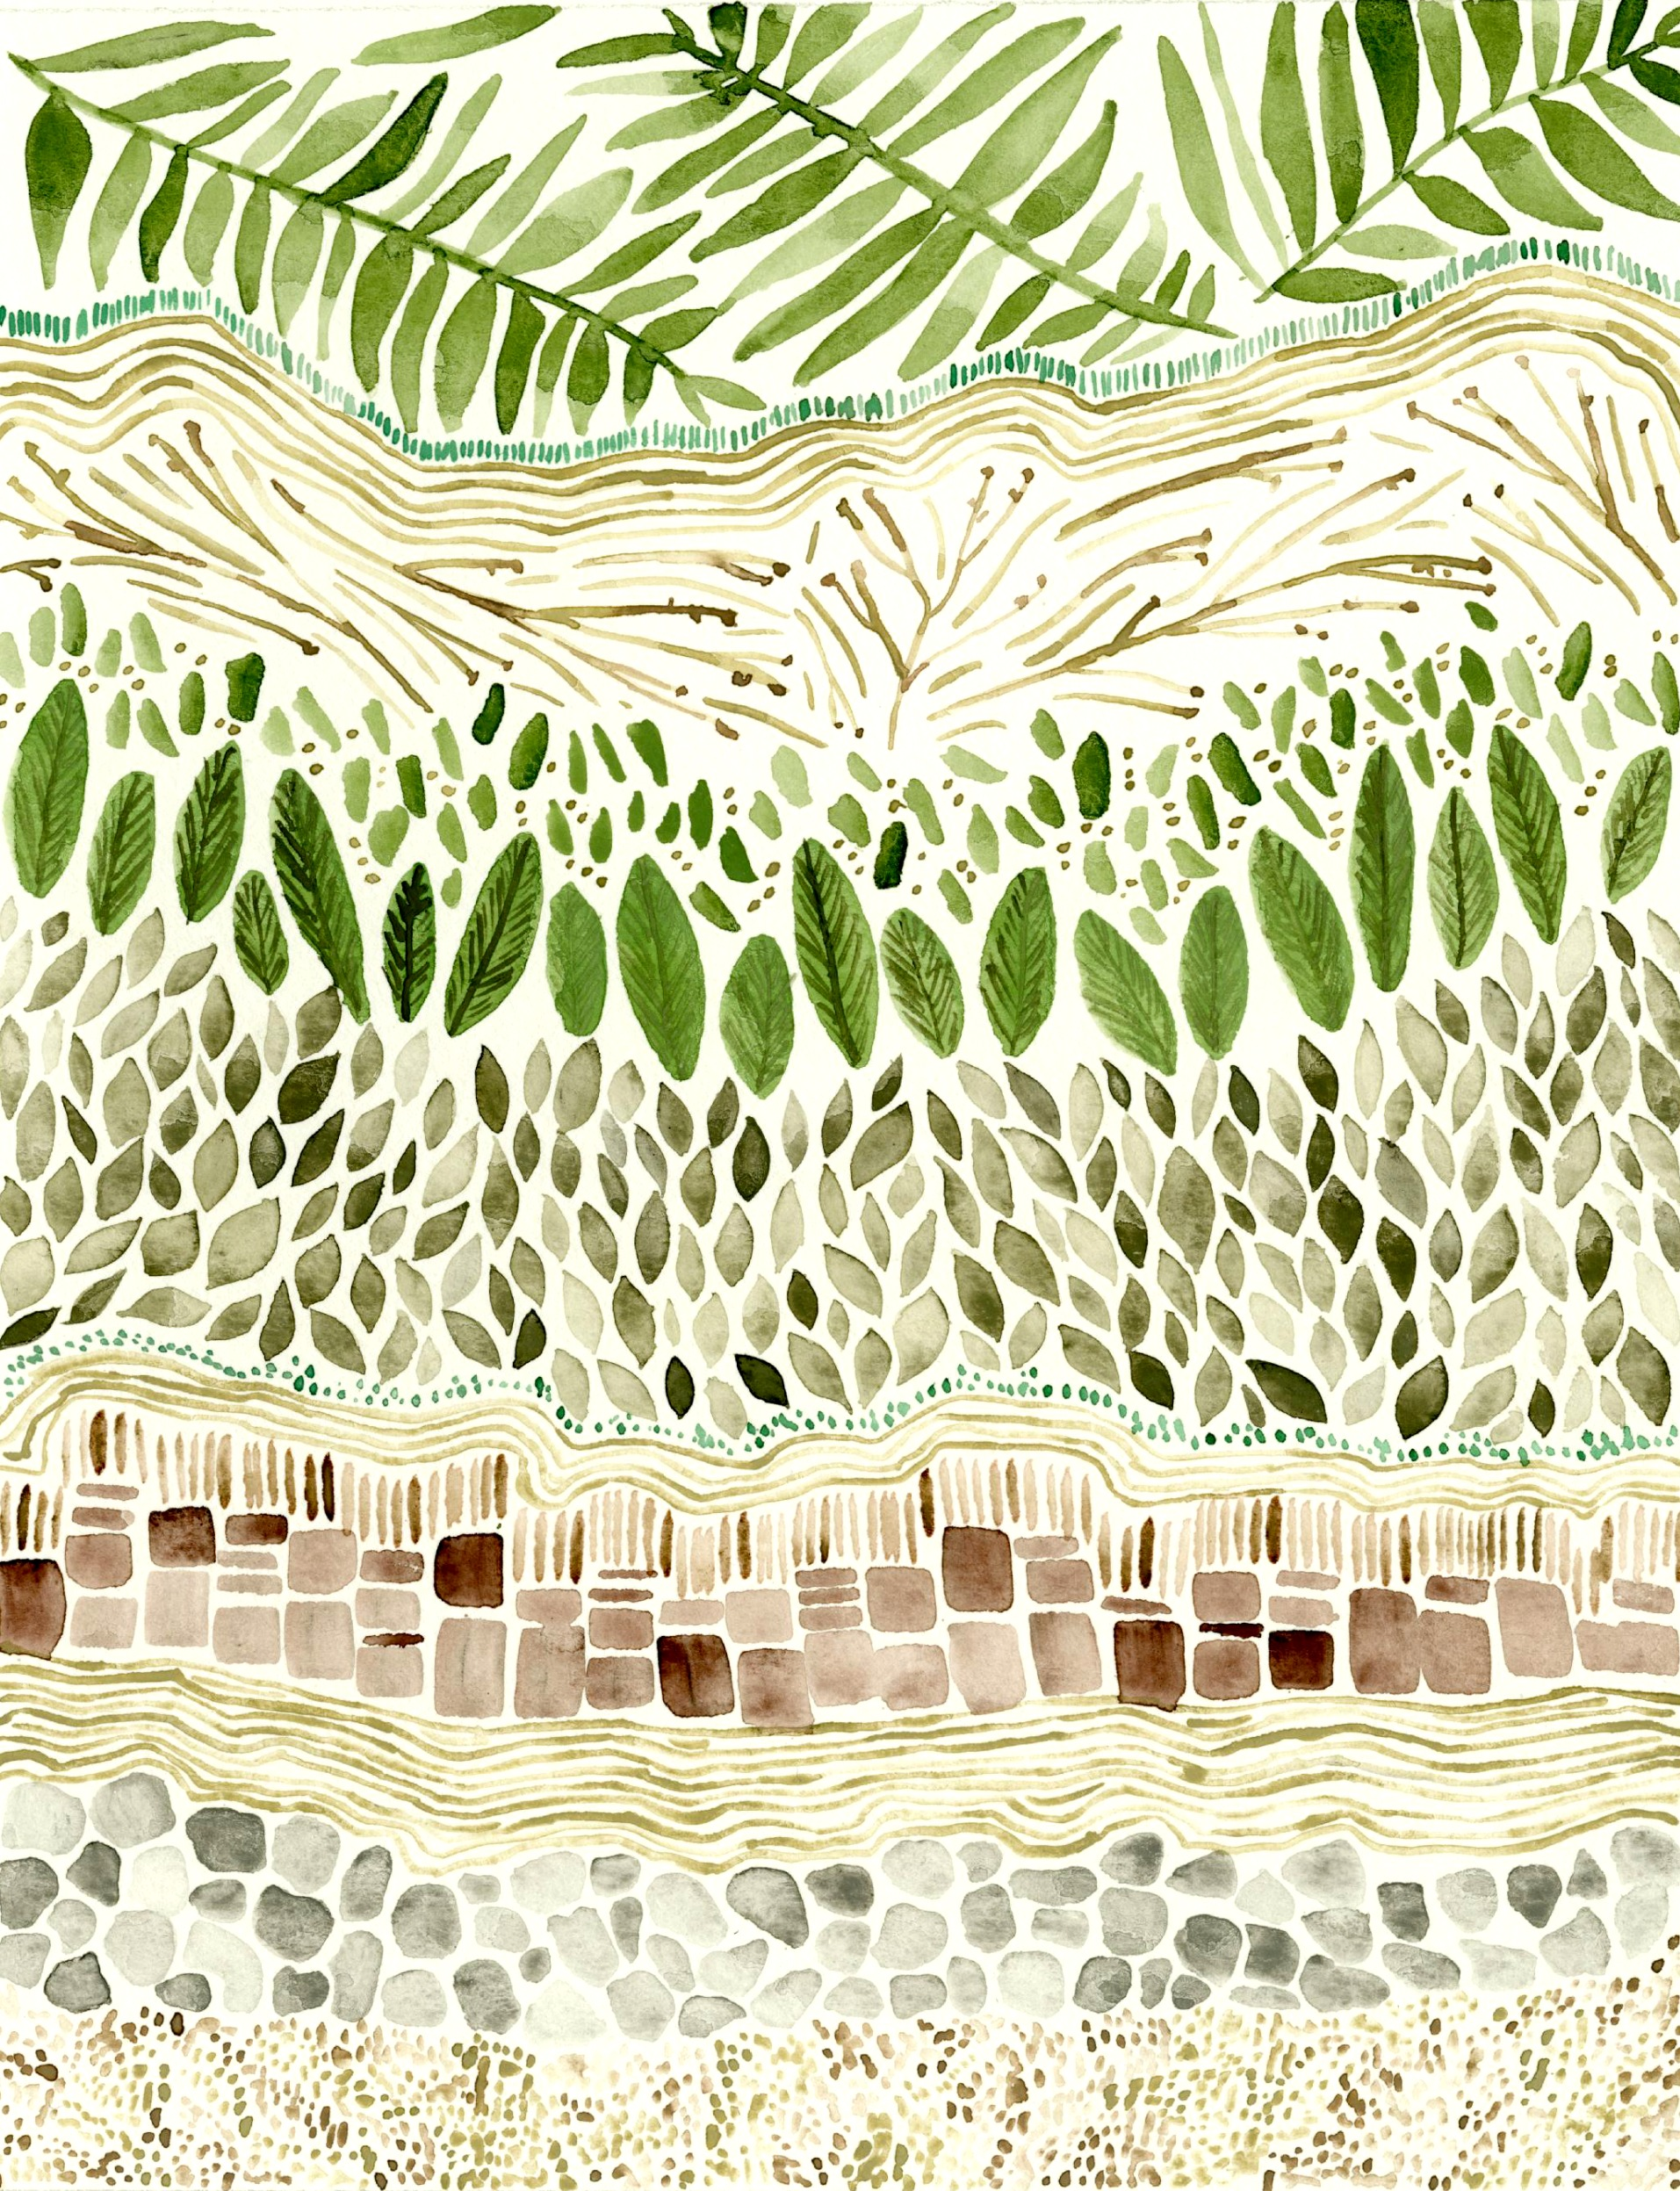 earth slice jpg.jpg